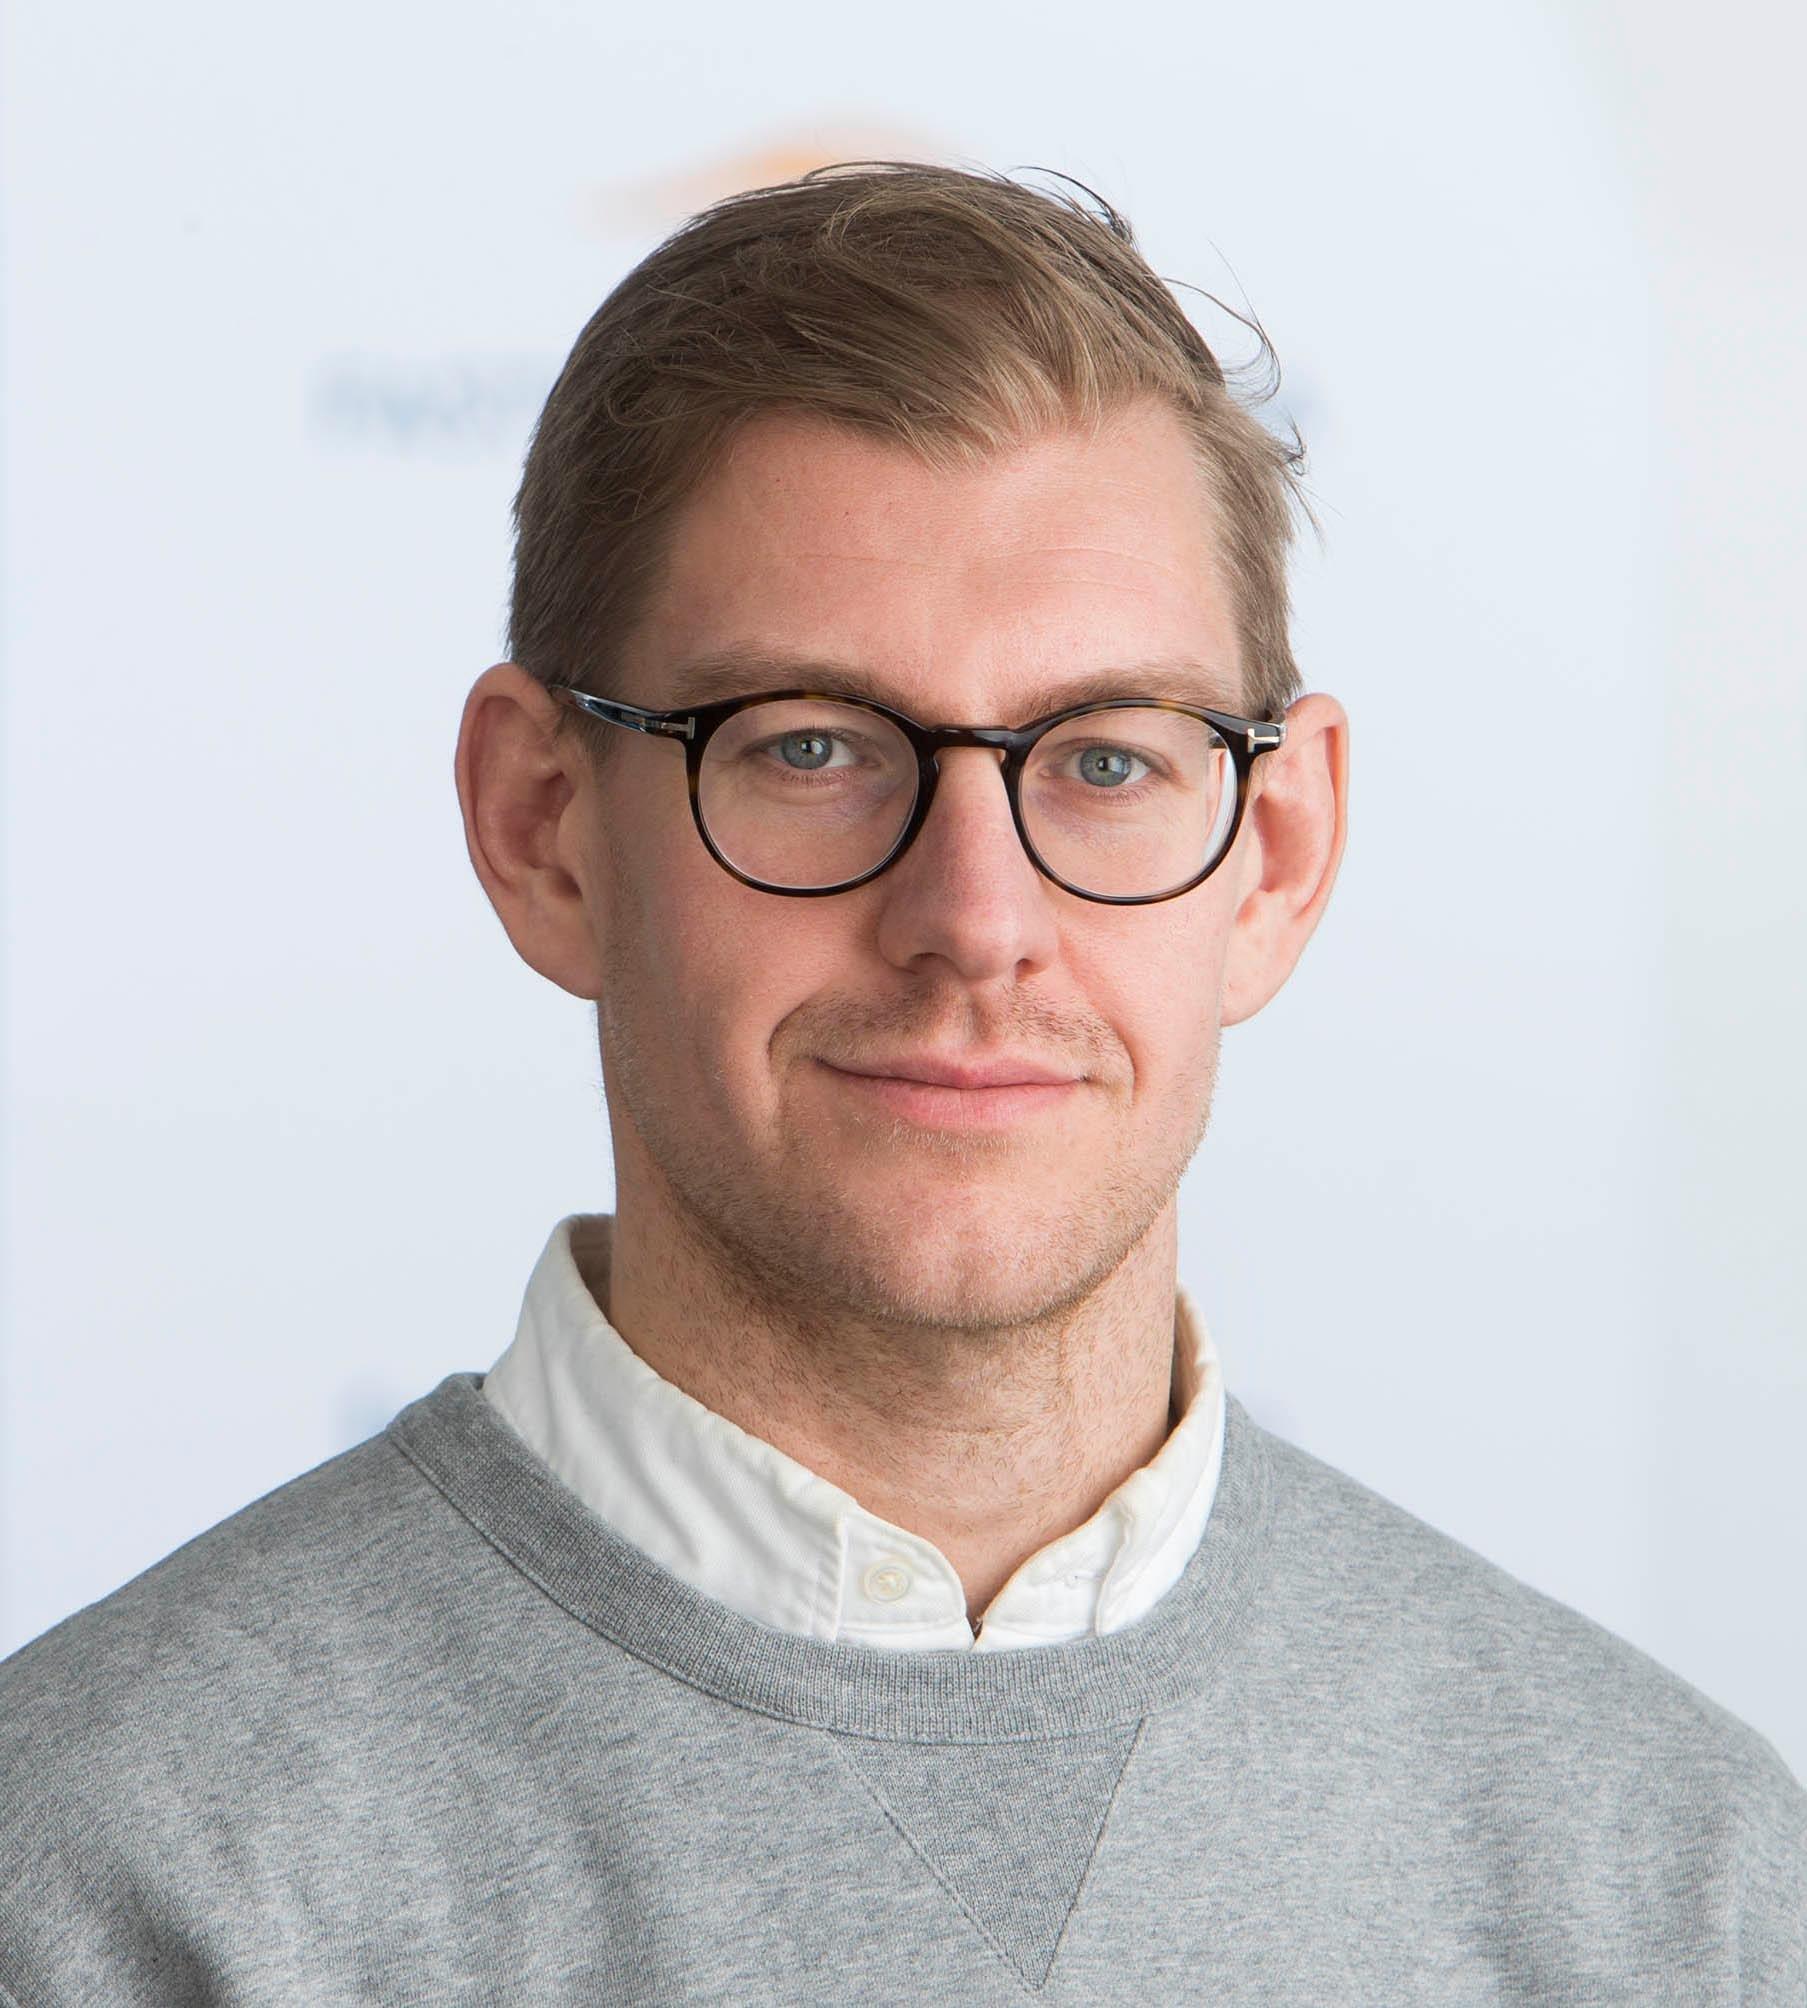 christoffer Börjesson